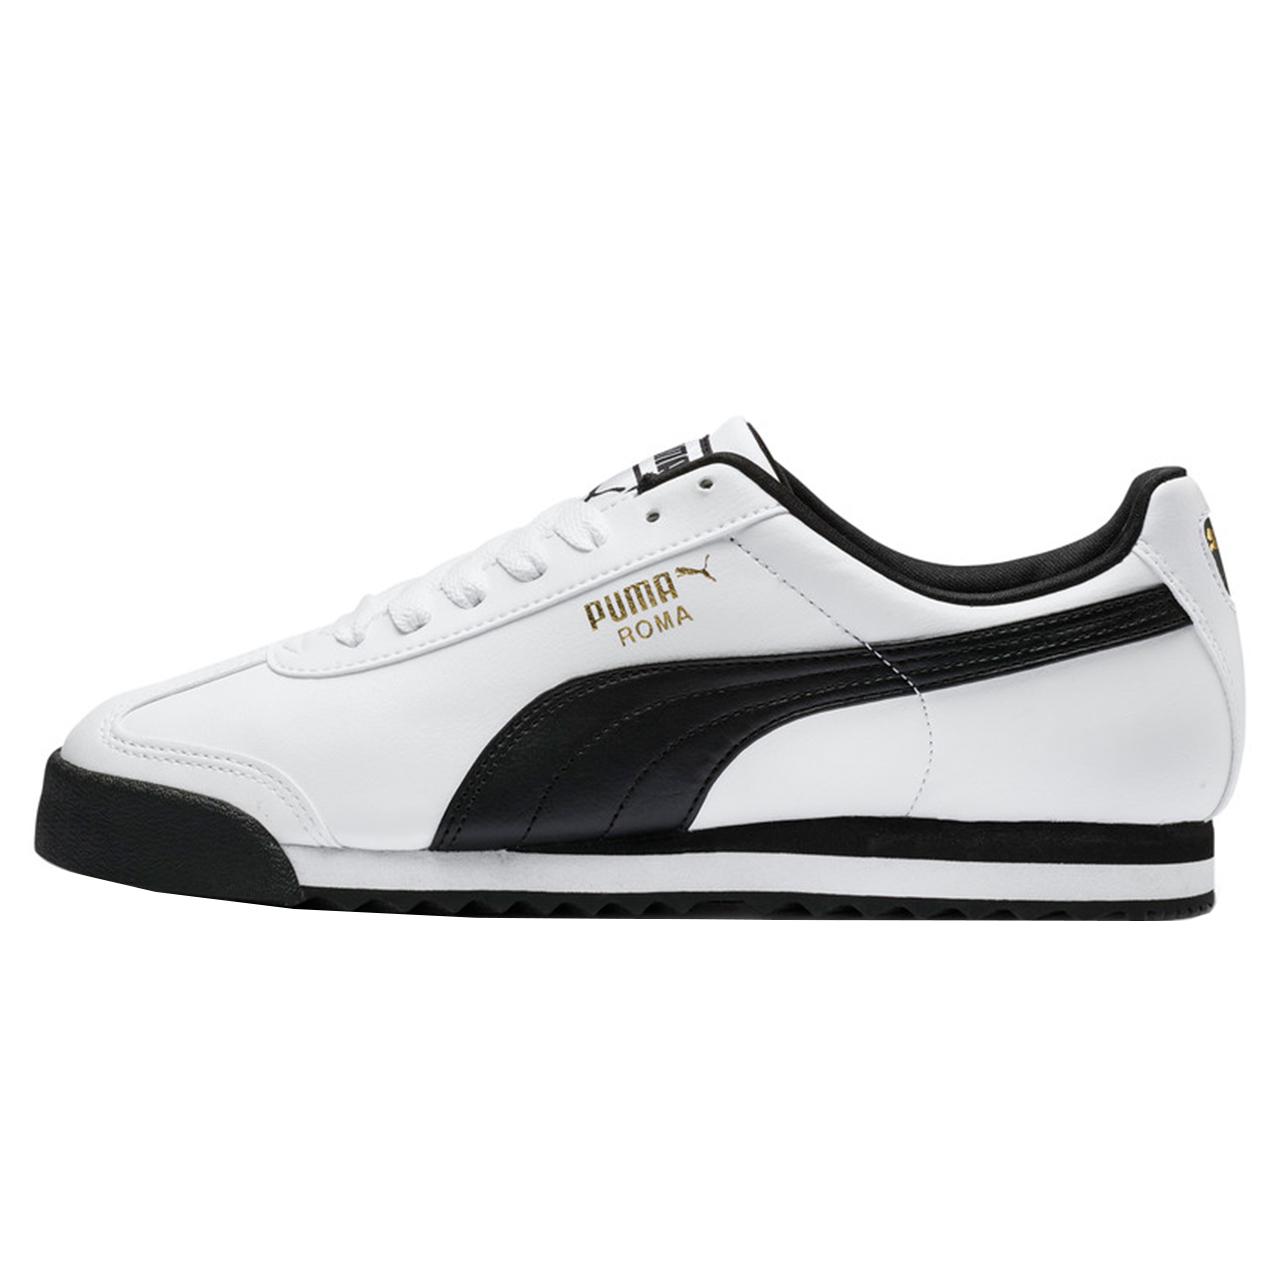 کفش راحتی مردانه پوما کد 35357204